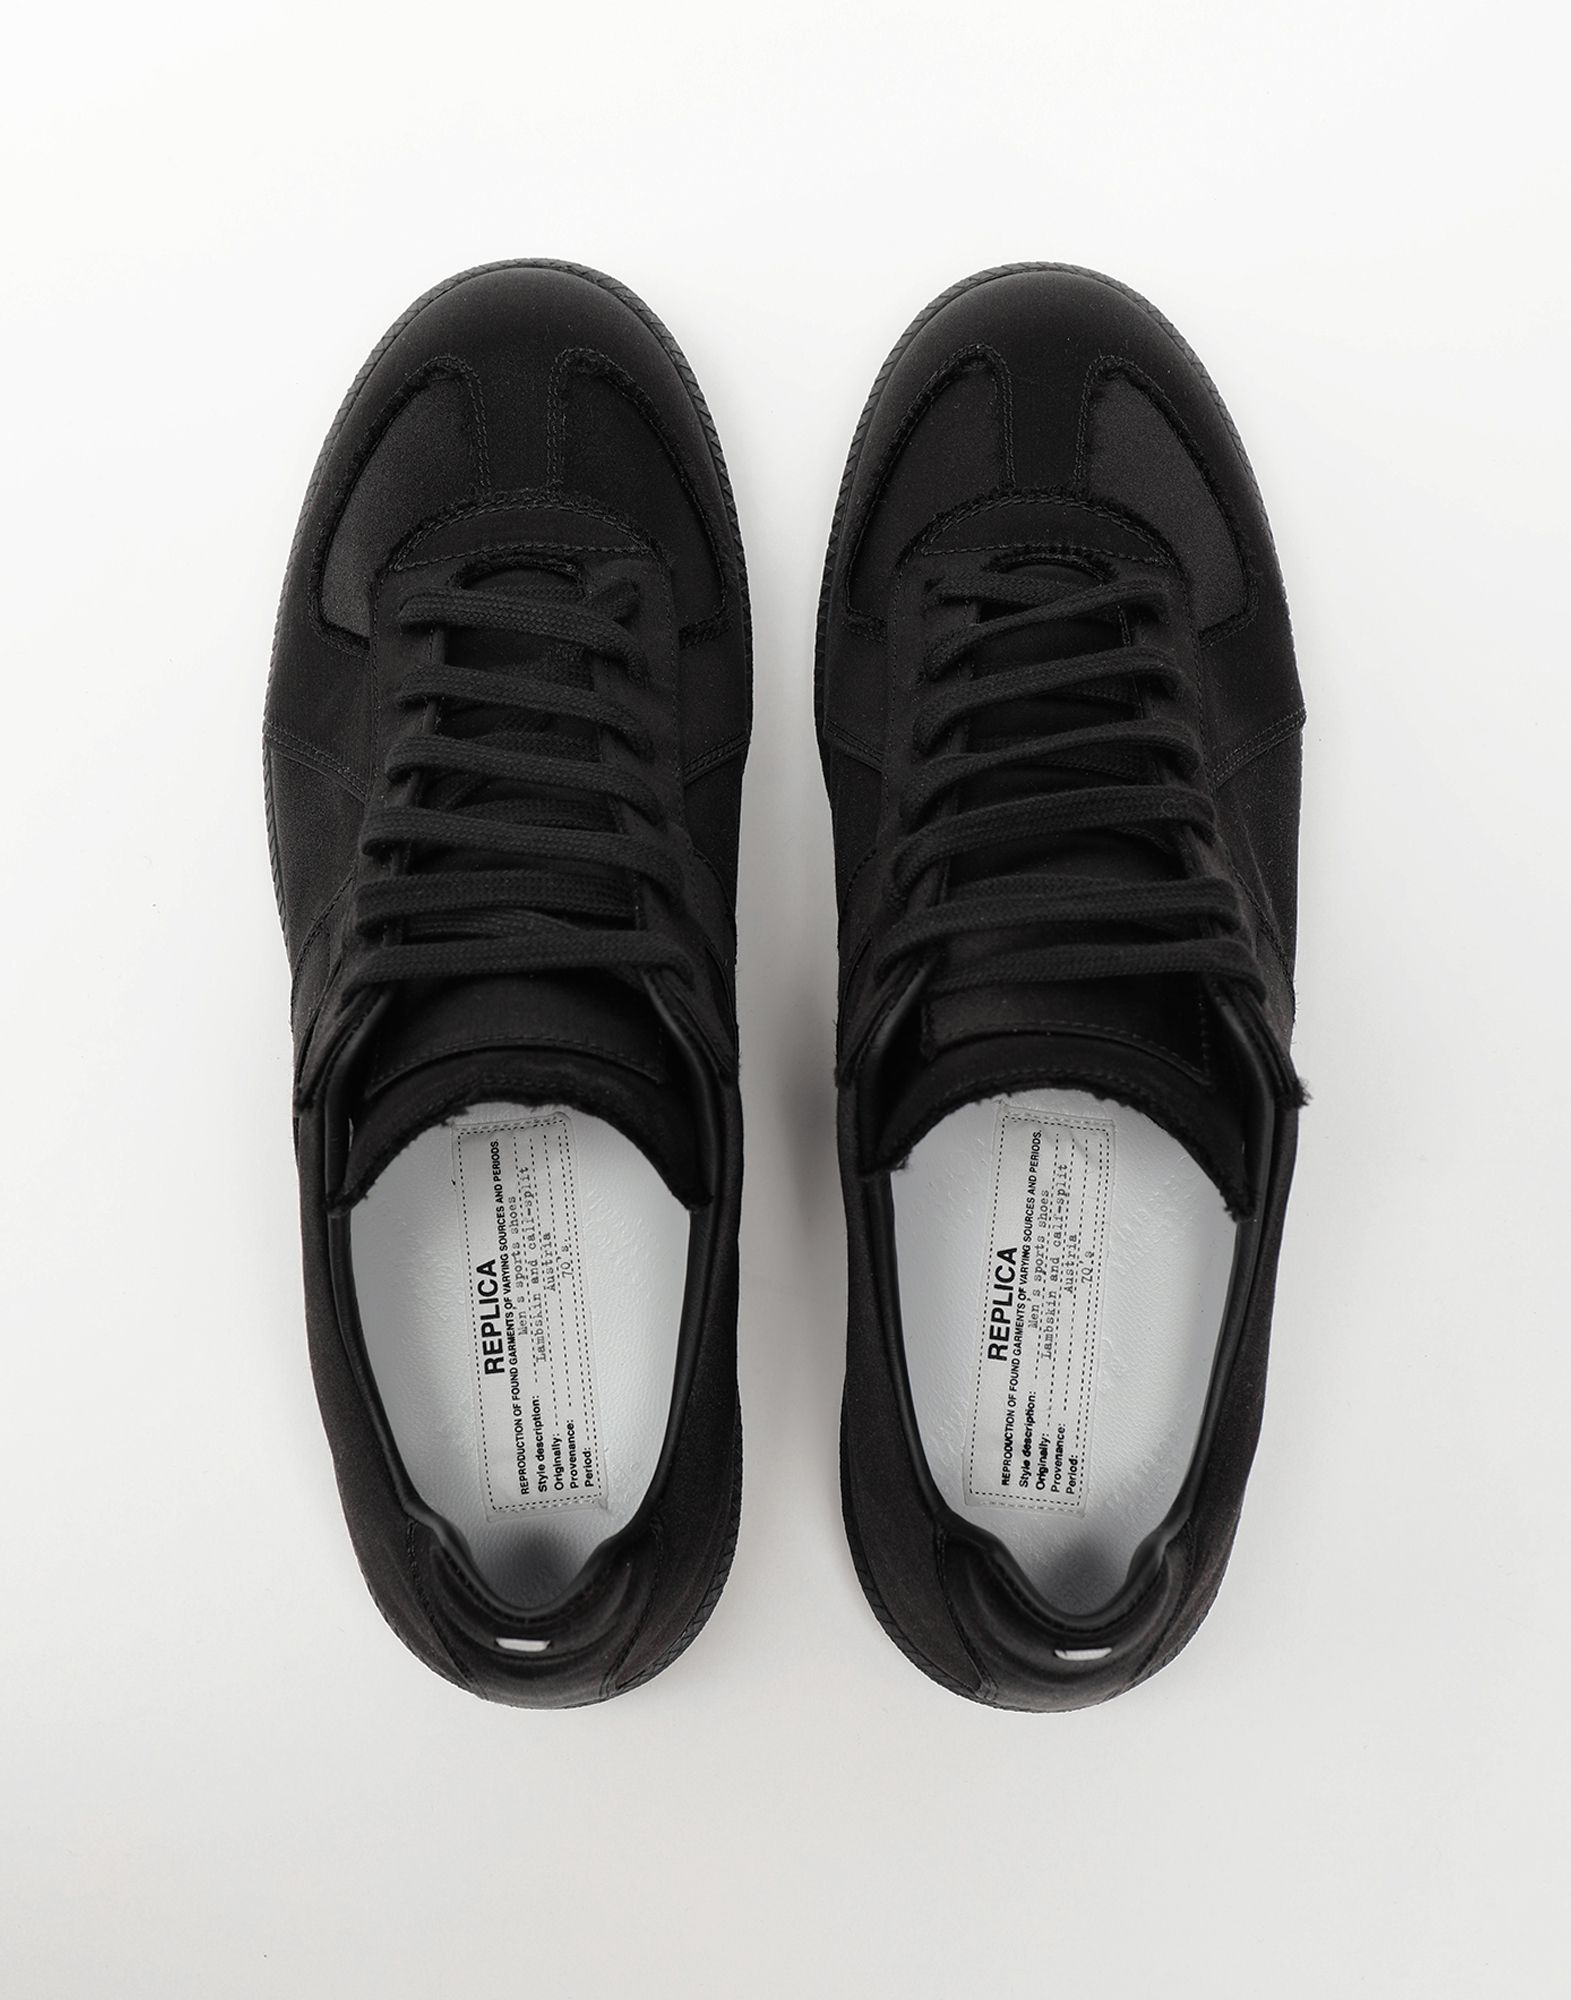 MAISON MARGIELA Replica low top satin sneakers Sneakers Man d